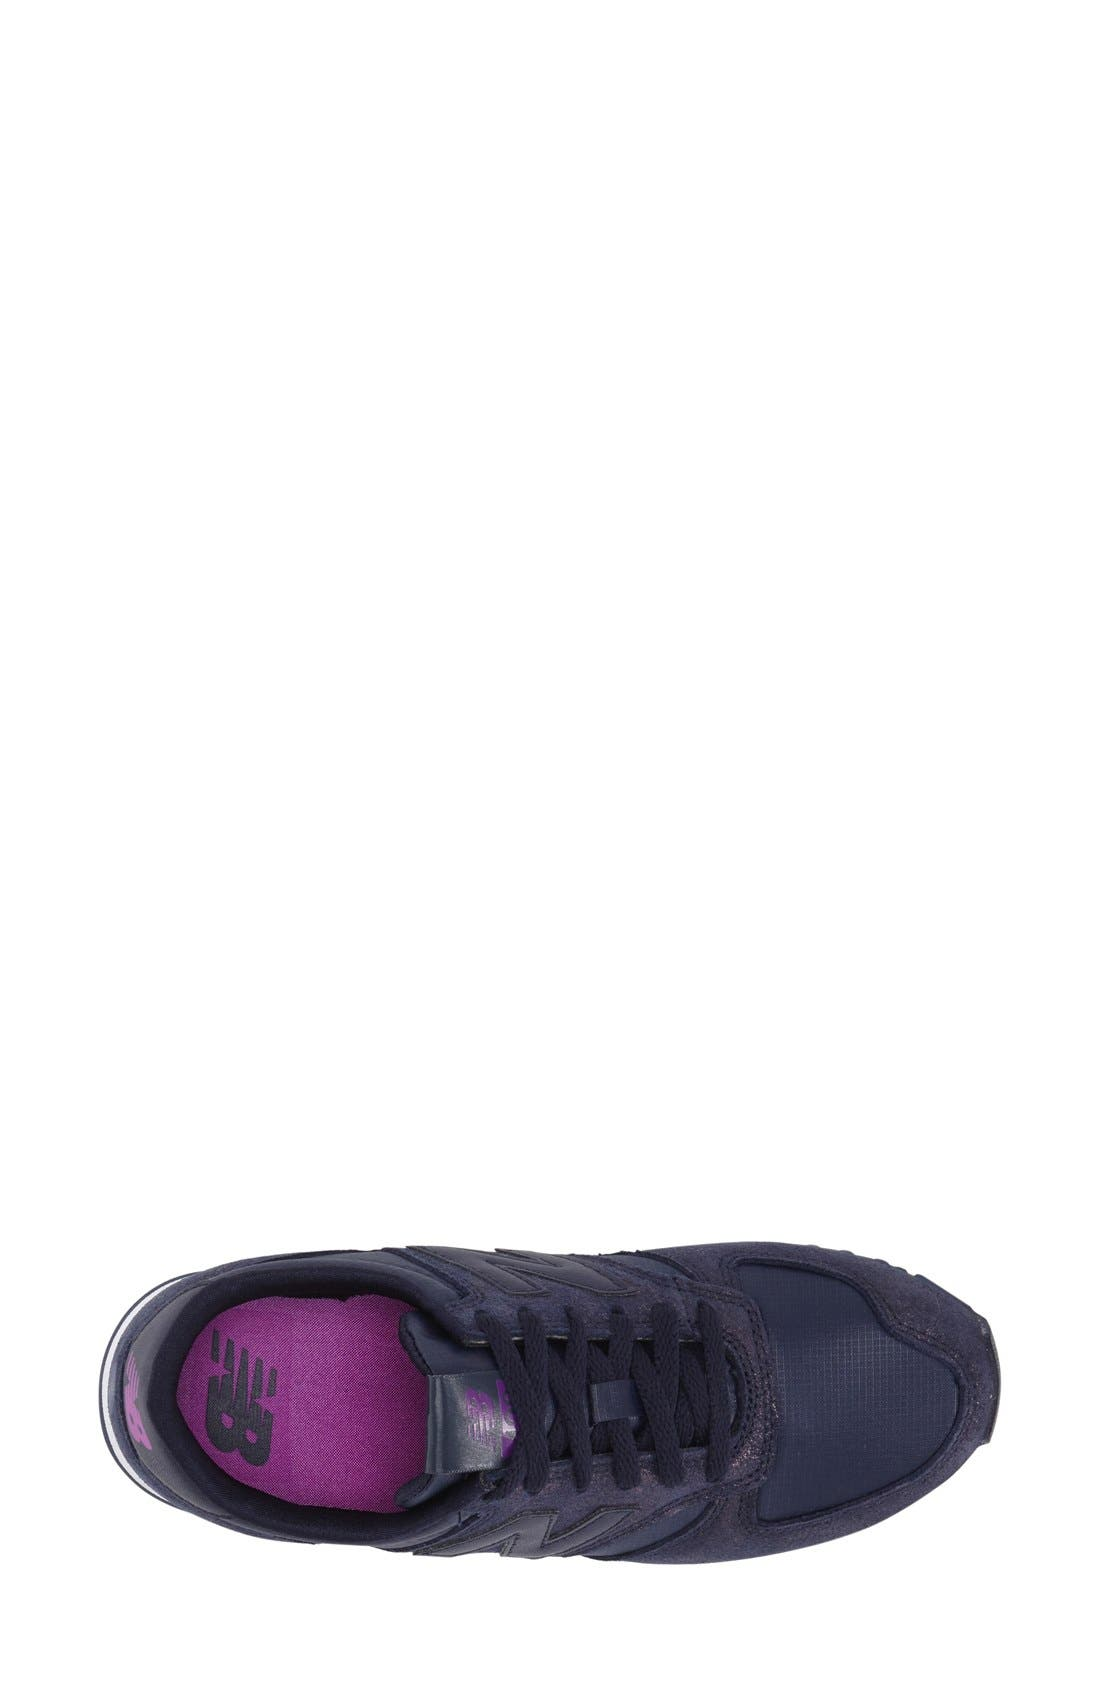 '420' Sneaker,                             Alternate thumbnail 3, color,                             Dark Purple